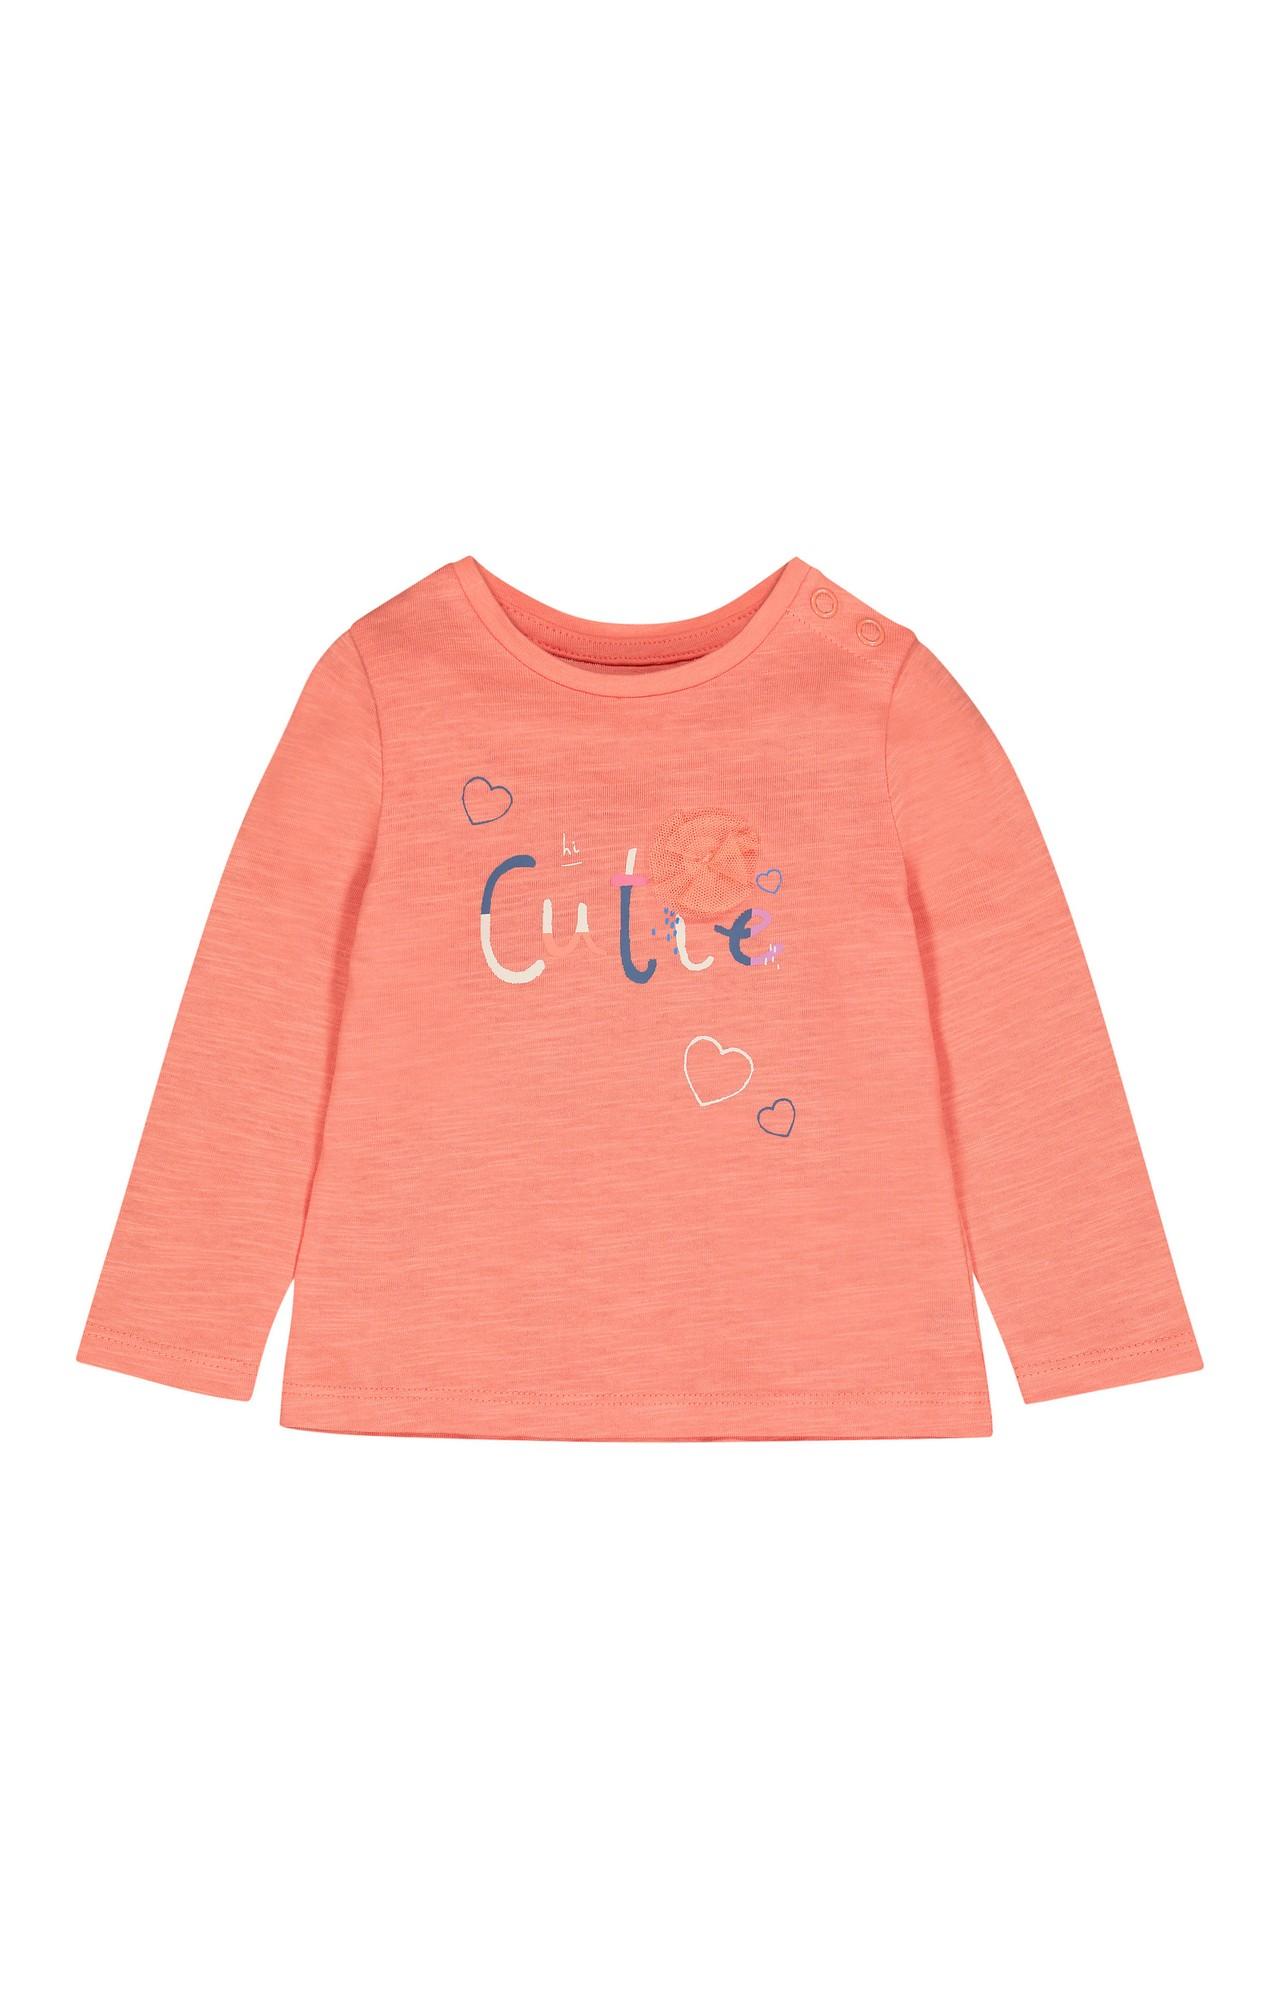 Mothercare | Peach Printed T-Shirt